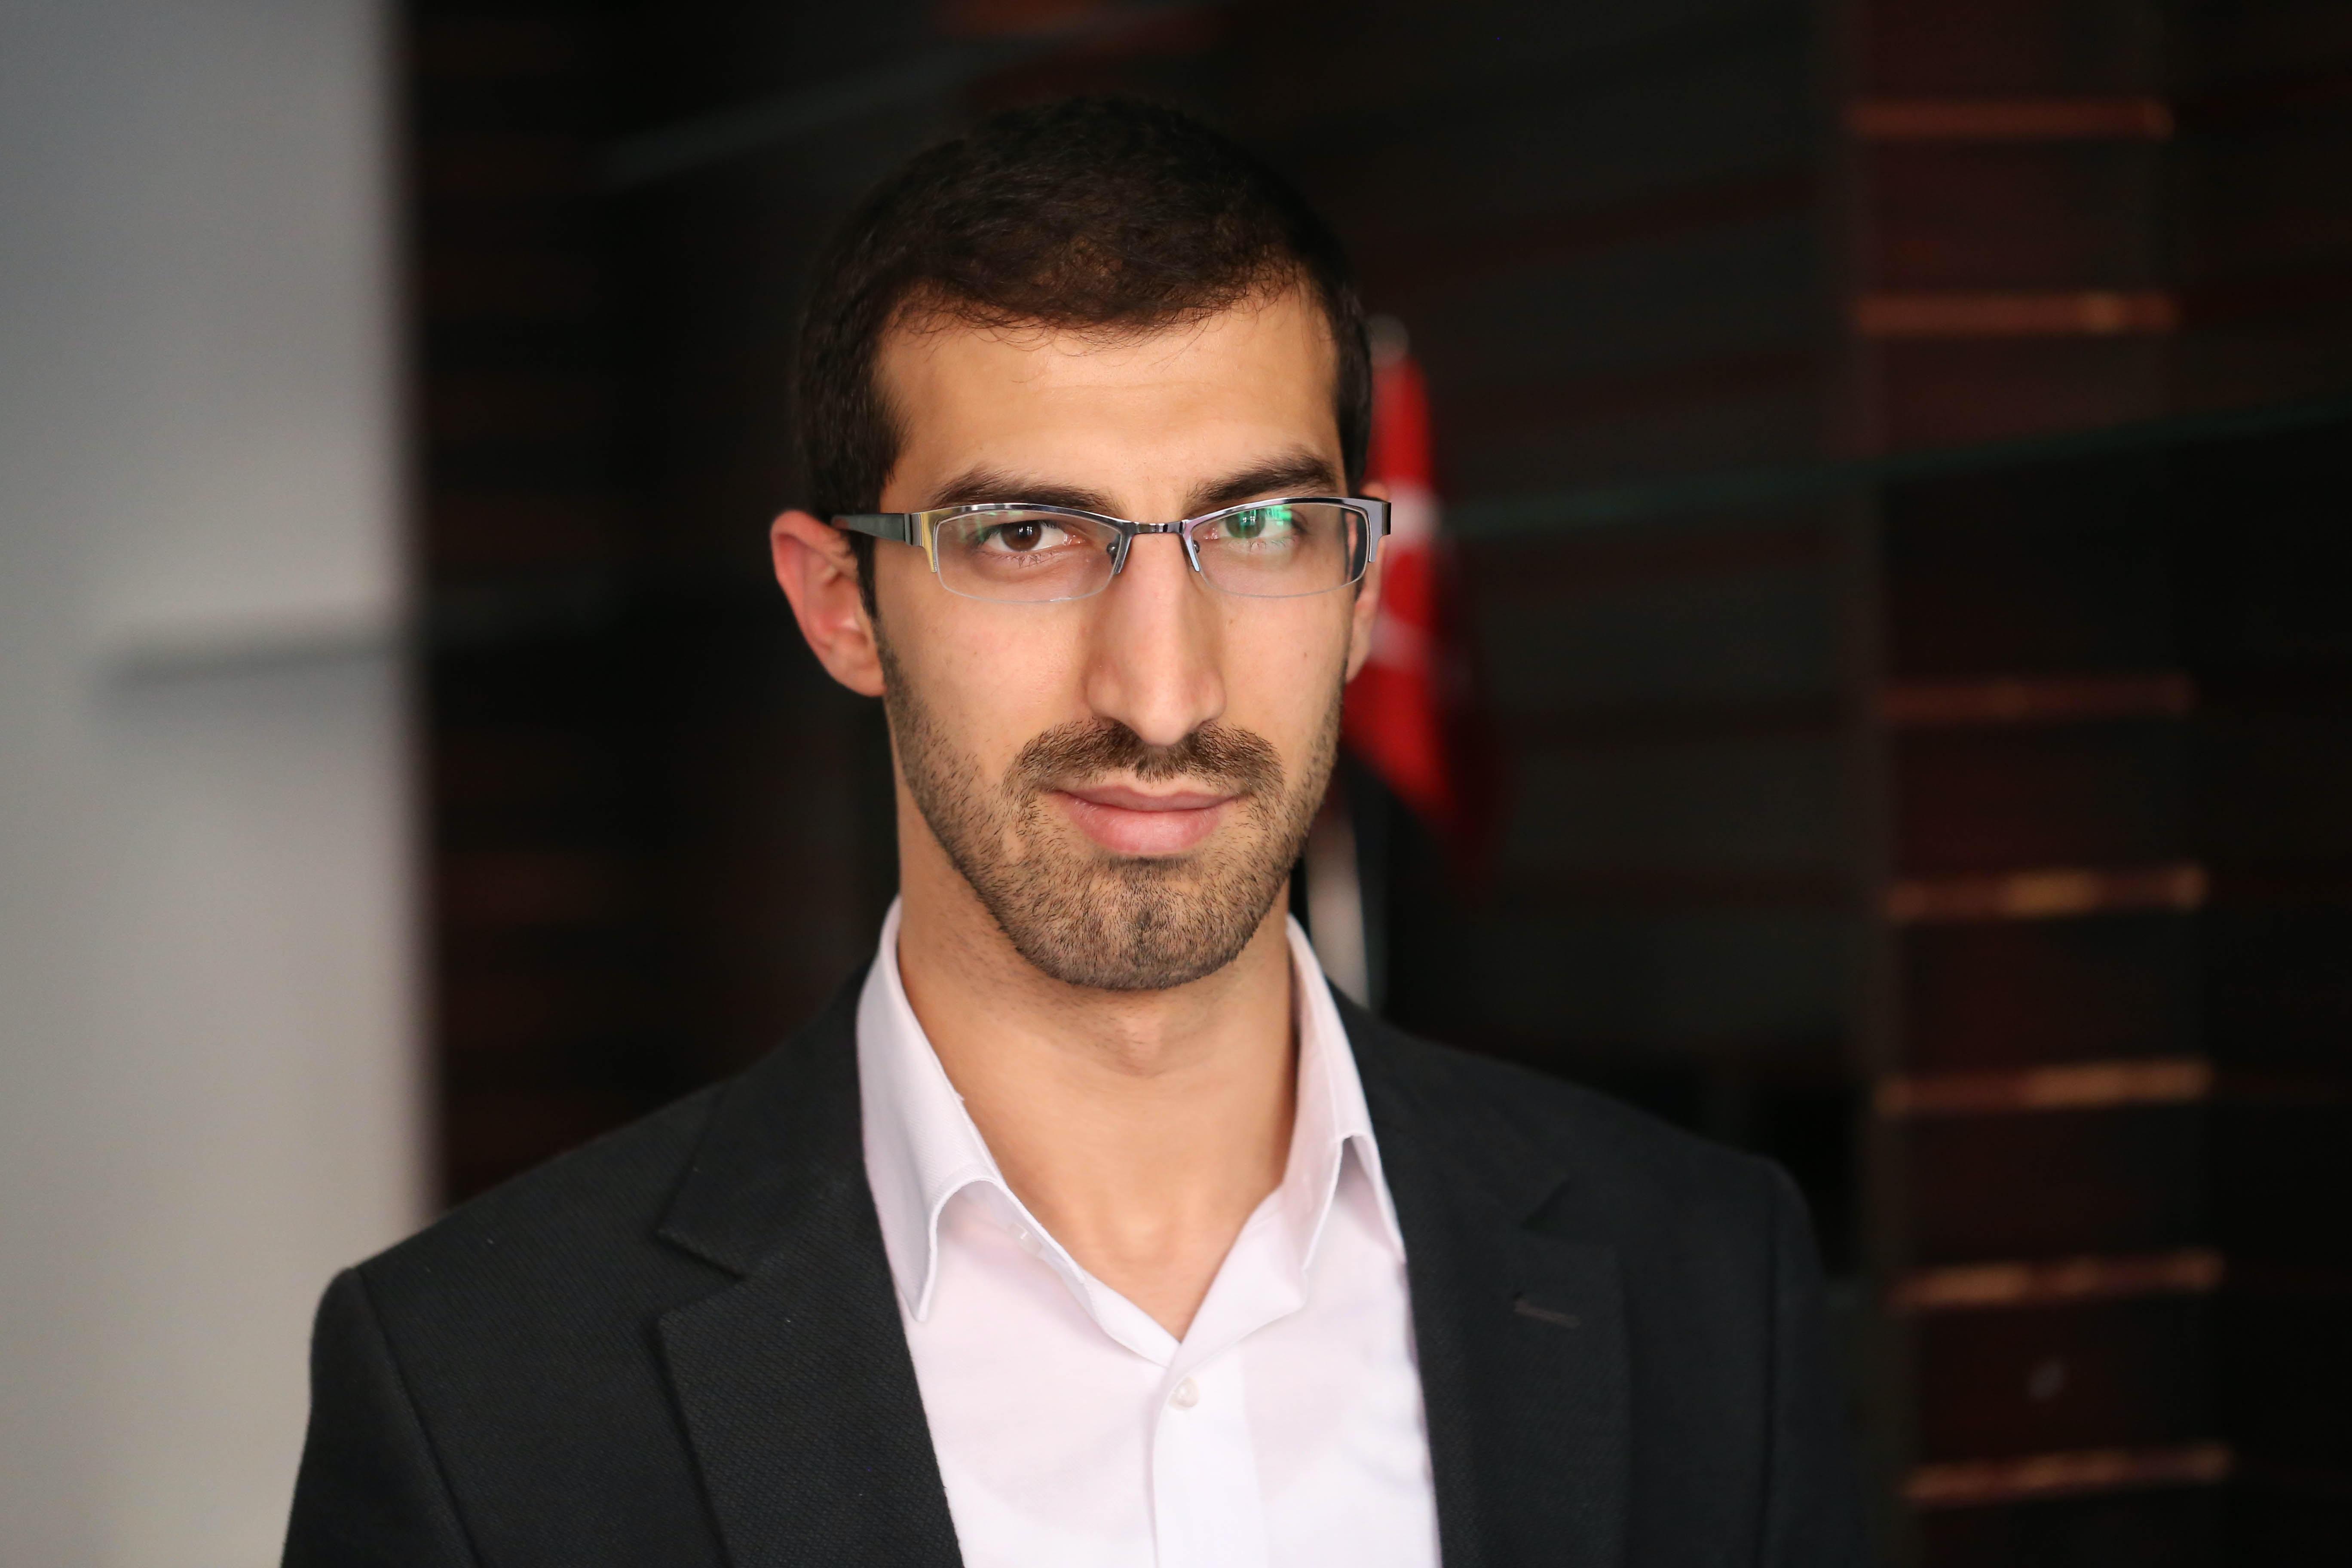 Go to Yusuf Ortaç's profile